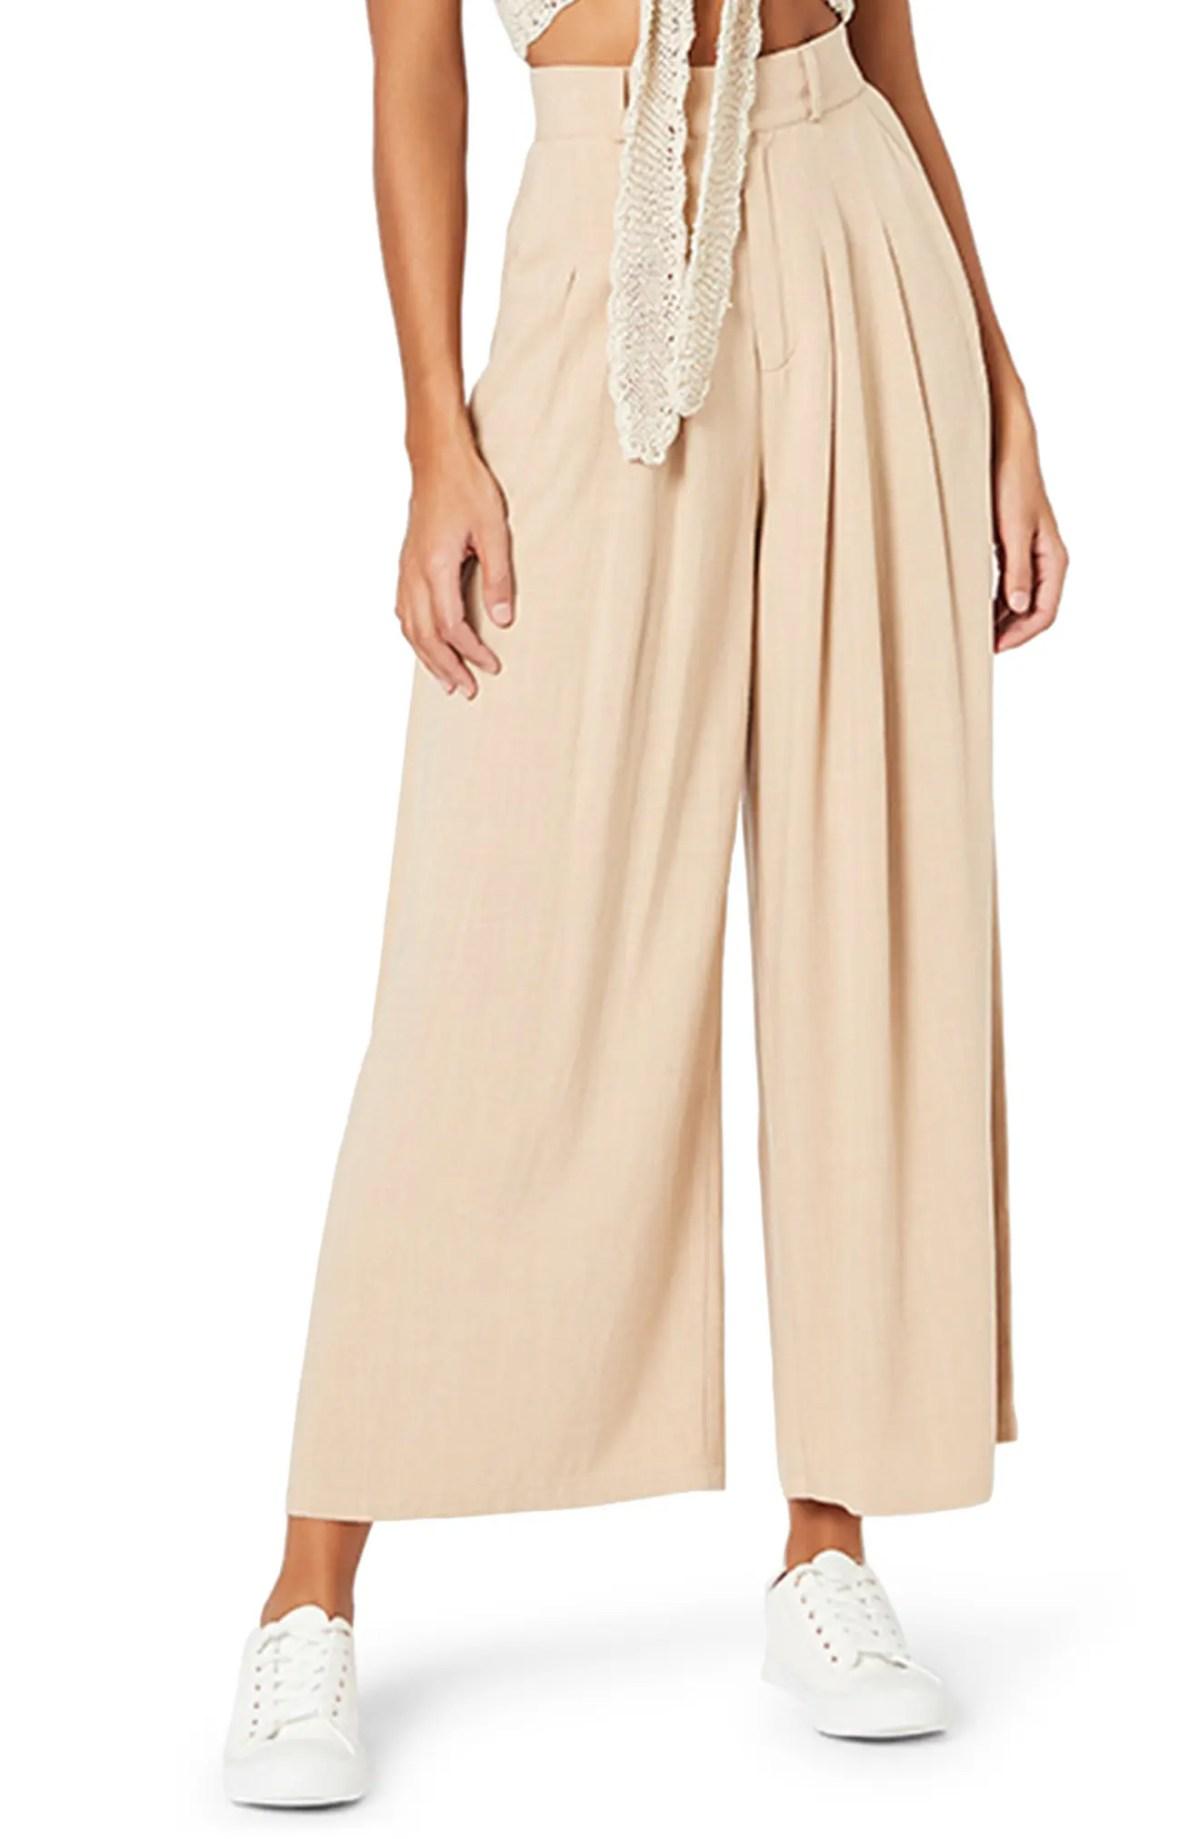 MINKPINK Taylah Wide Leg Pants, Main, color, NATURAL